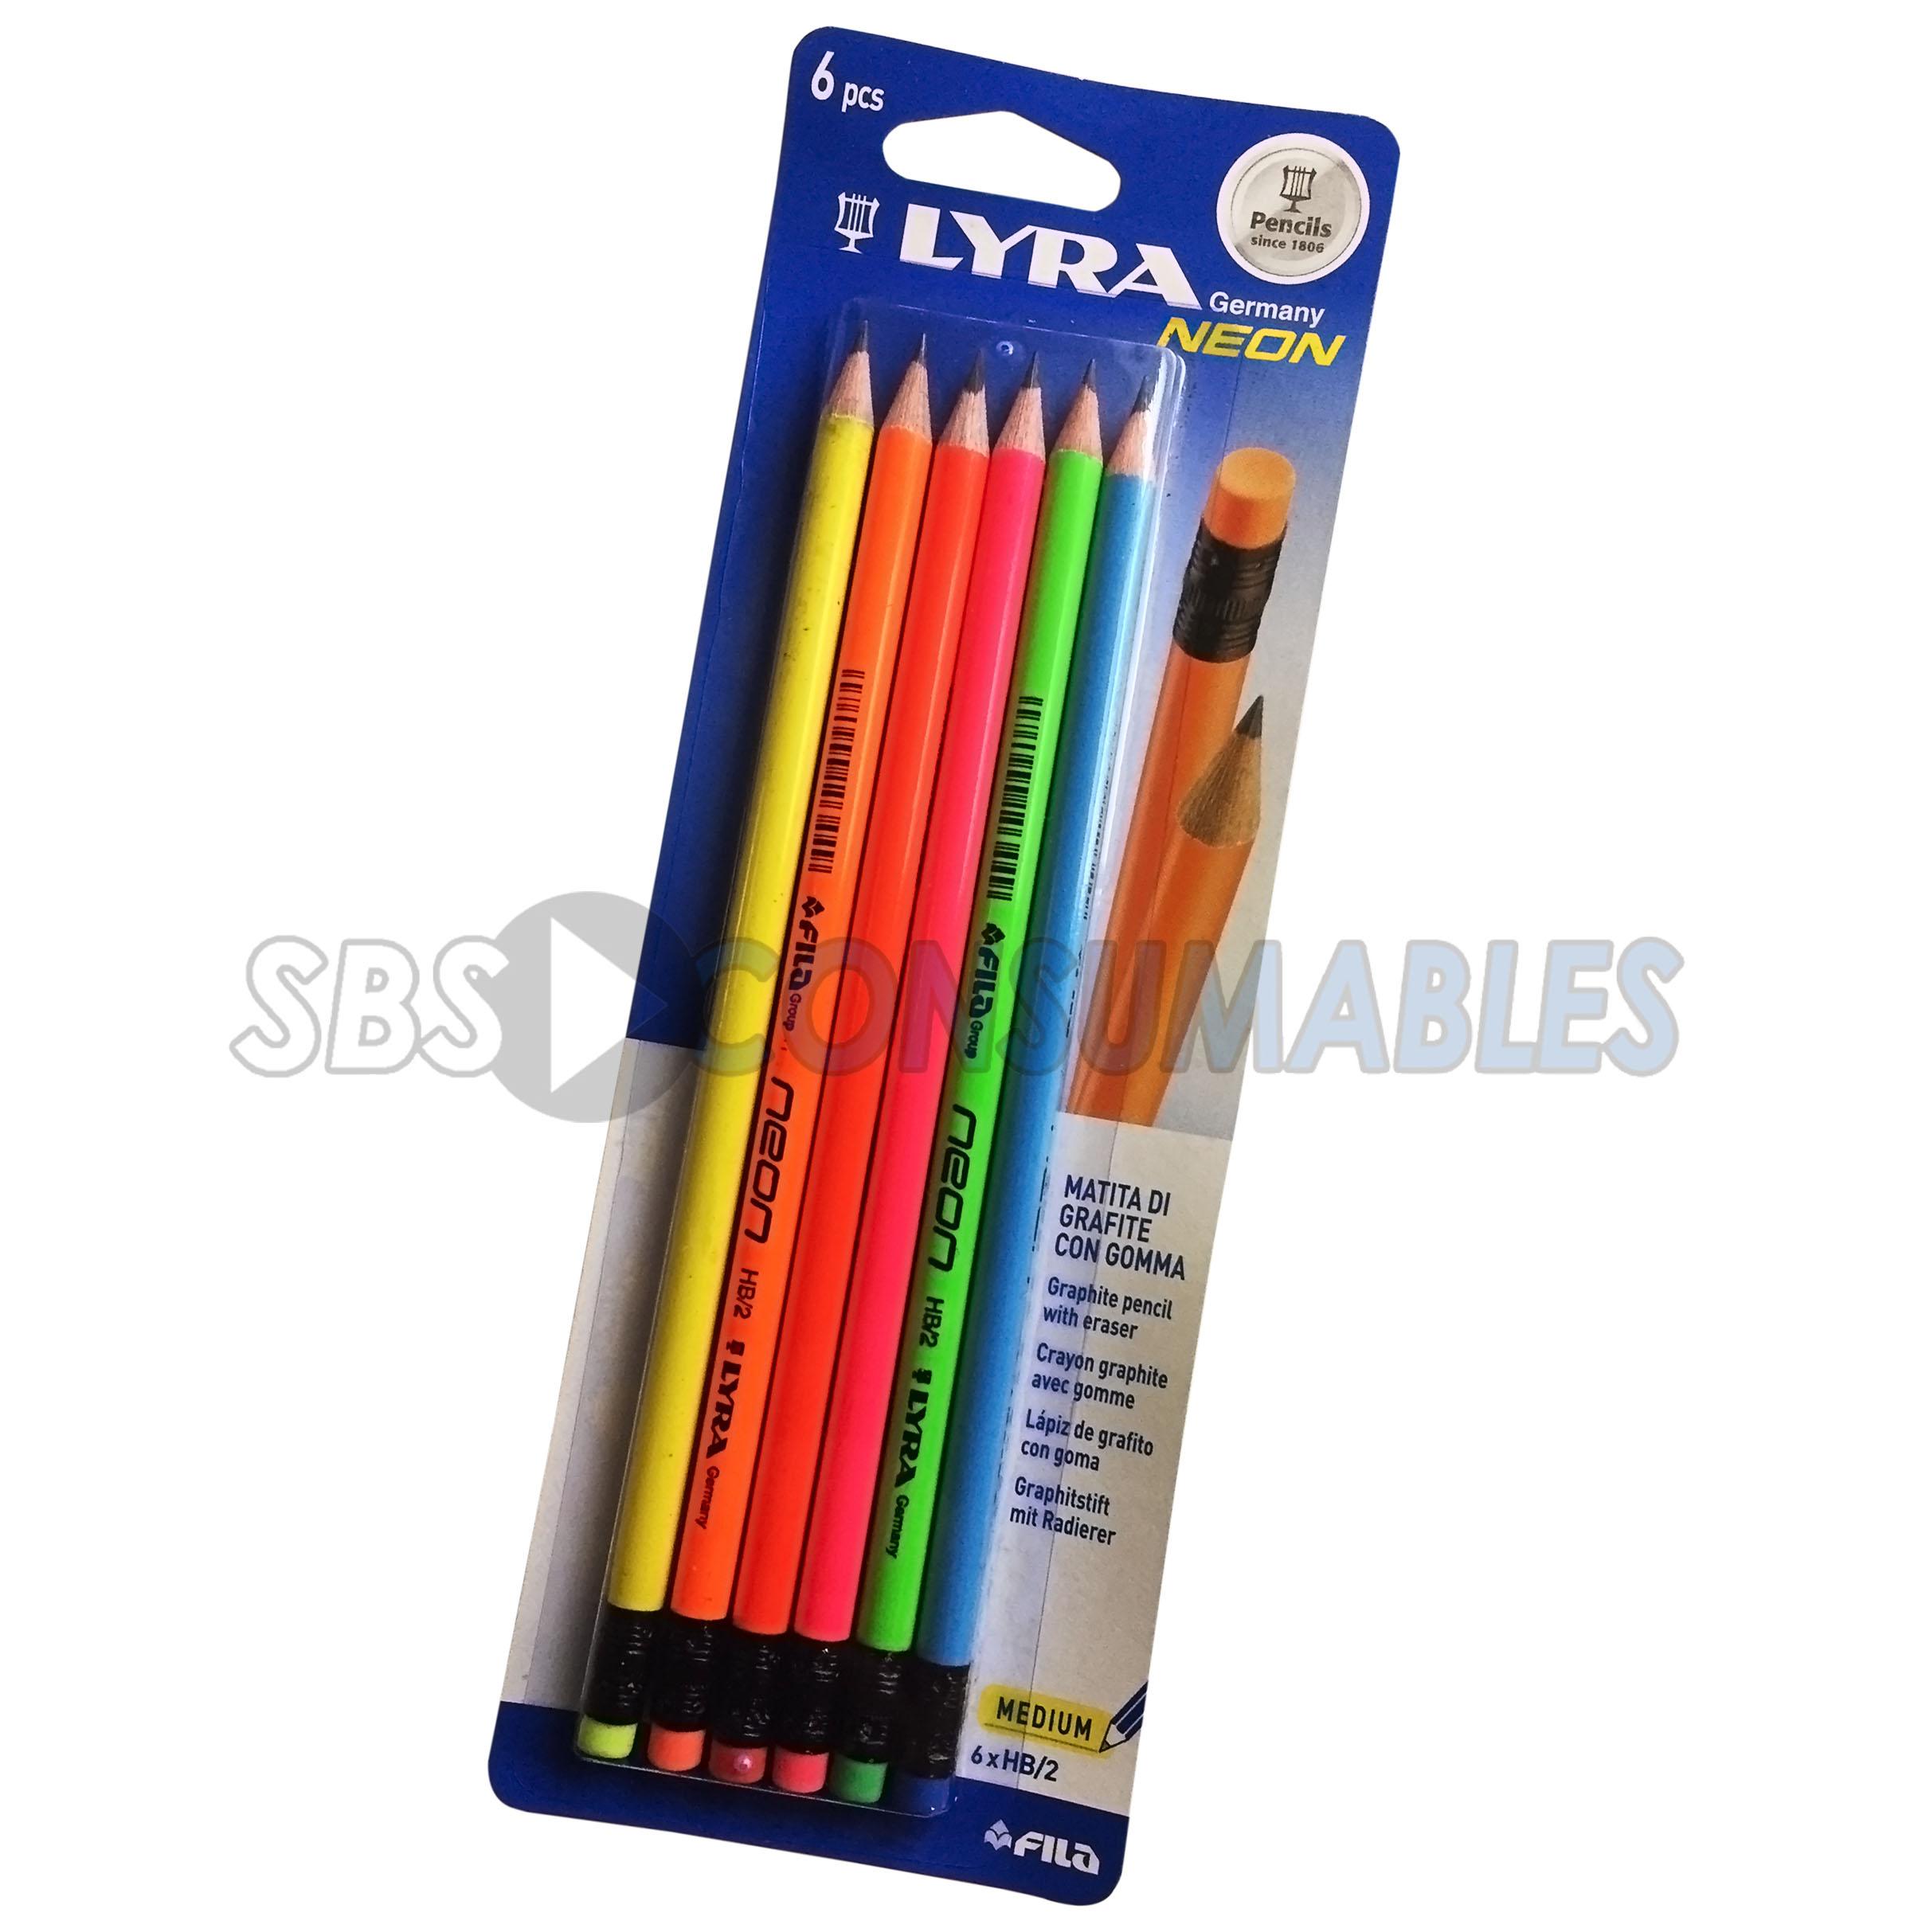 6x HB/2 Writing Pencils. Neon Bodies. | Office Supplies UK